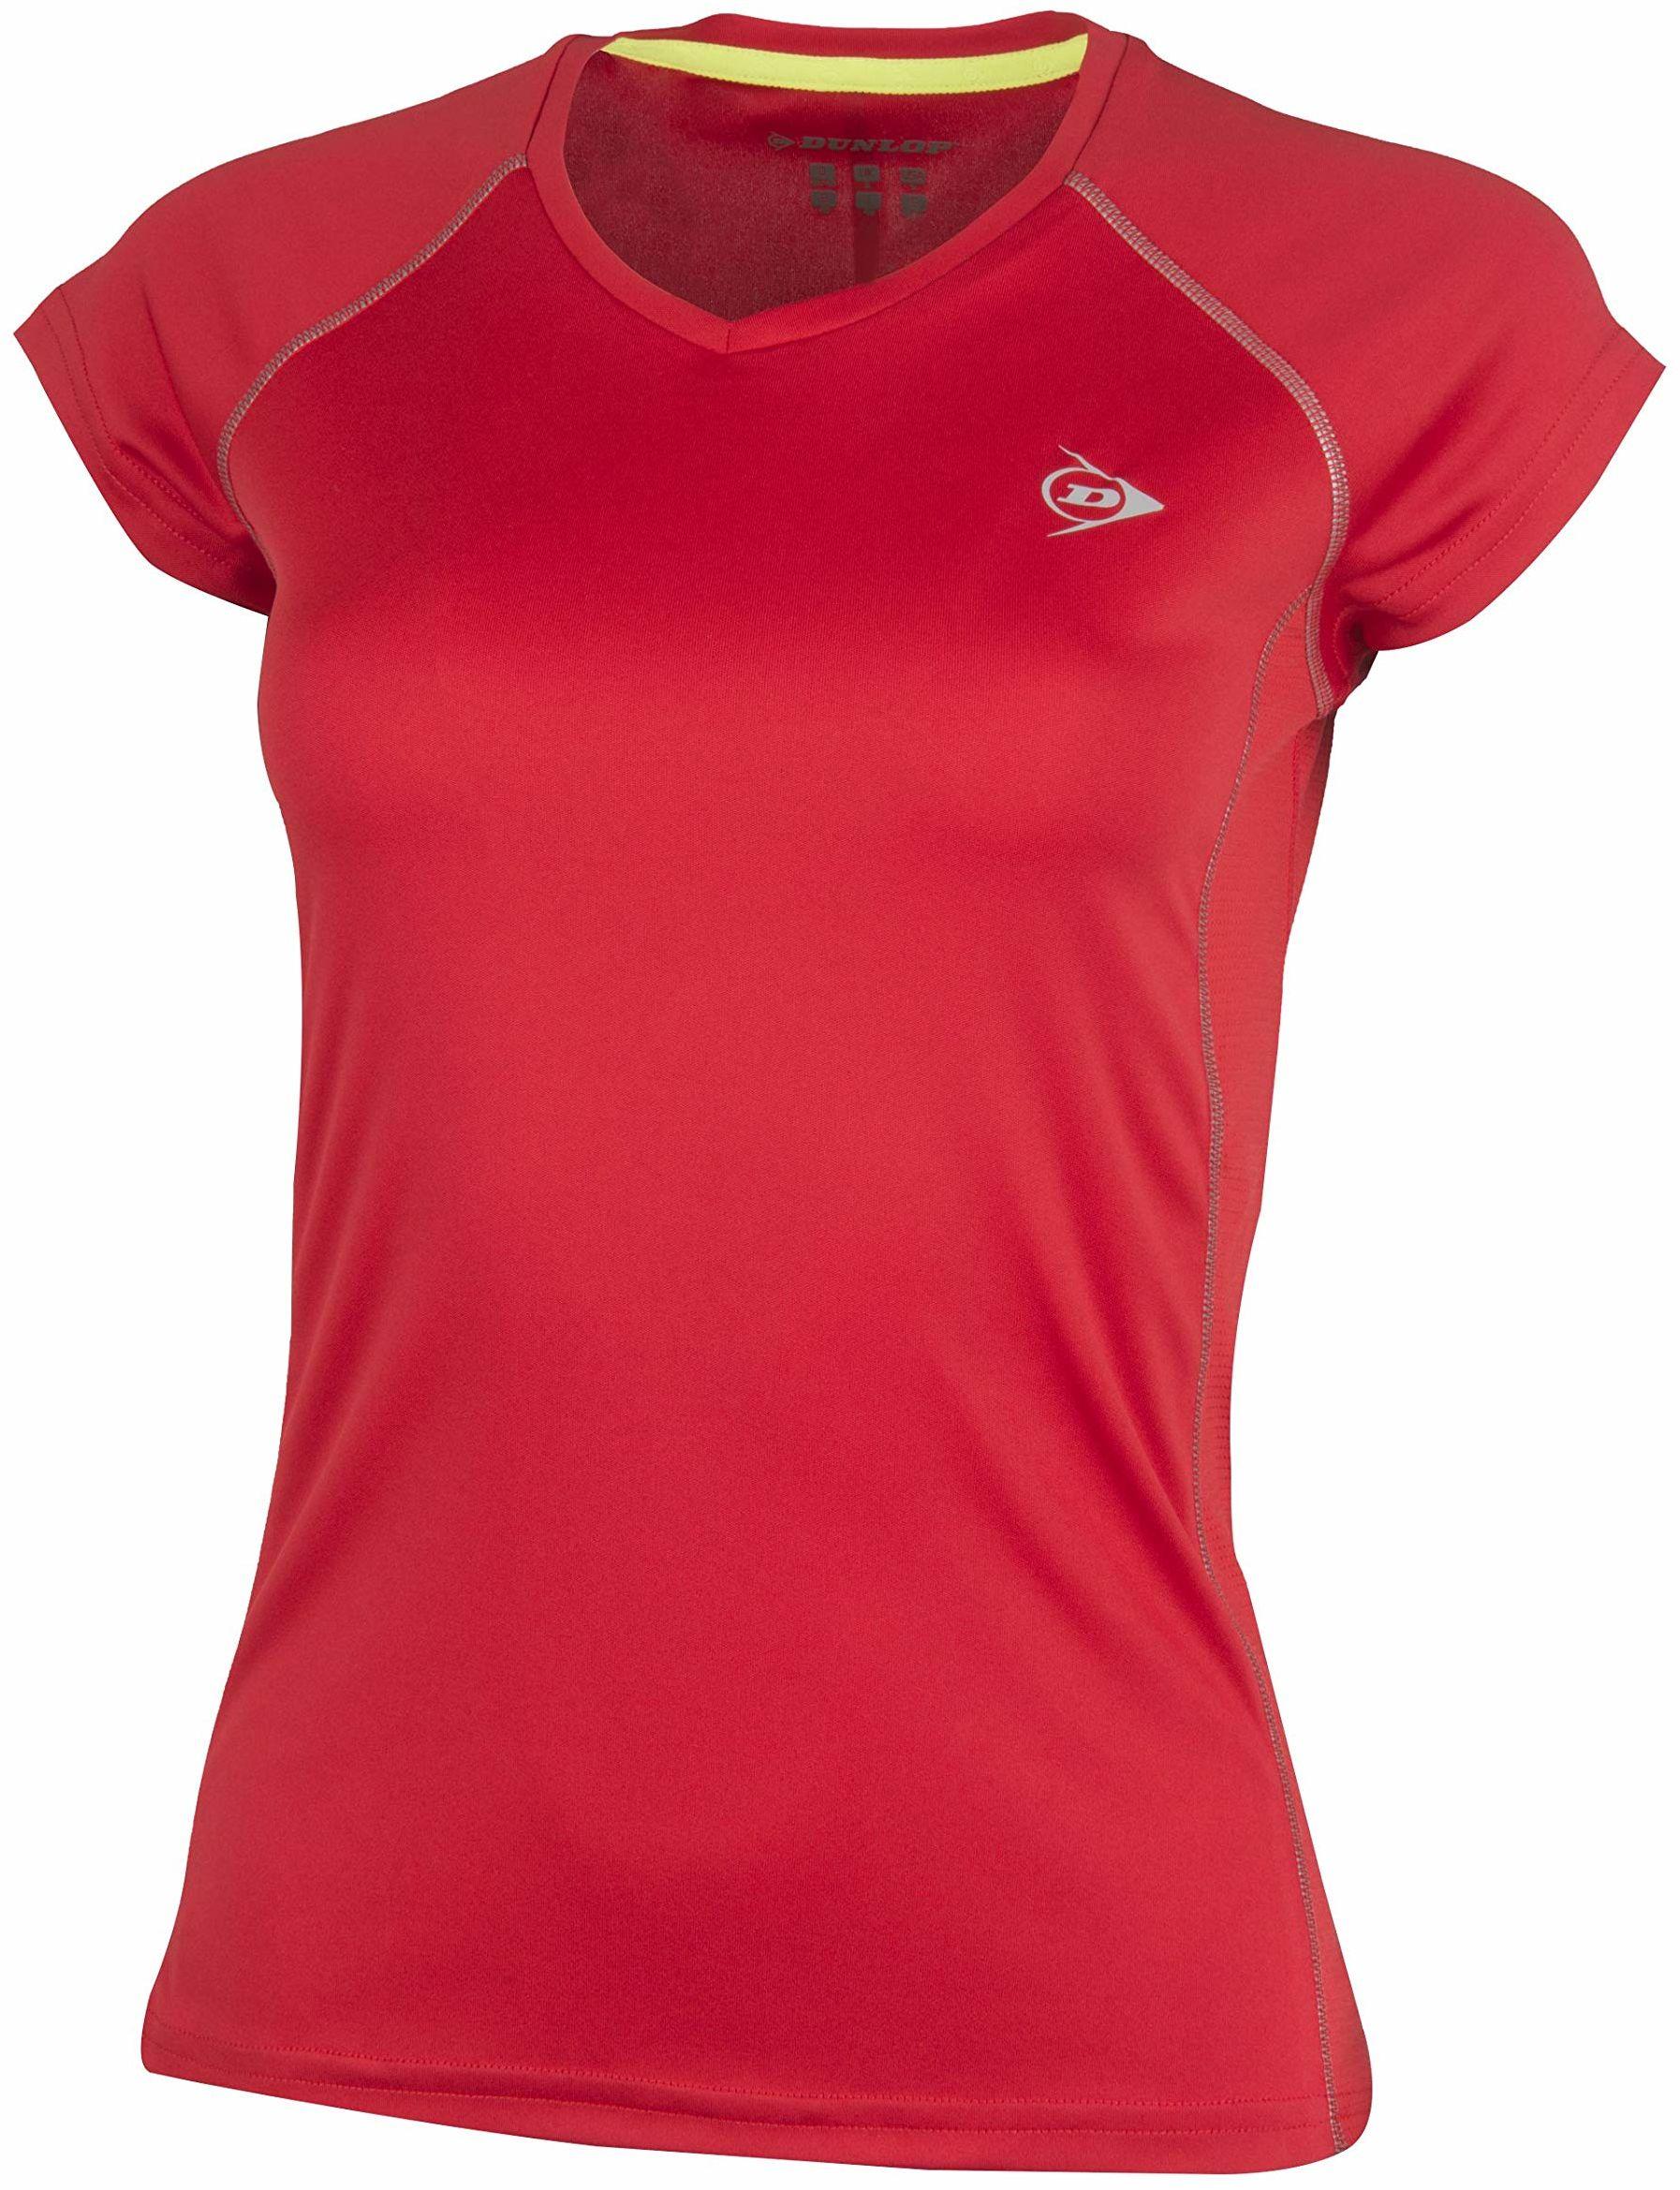 Dunlop Club Line Ladies Crew Tee Club Line Ladies Crew Tee czerwony czerwony X-S